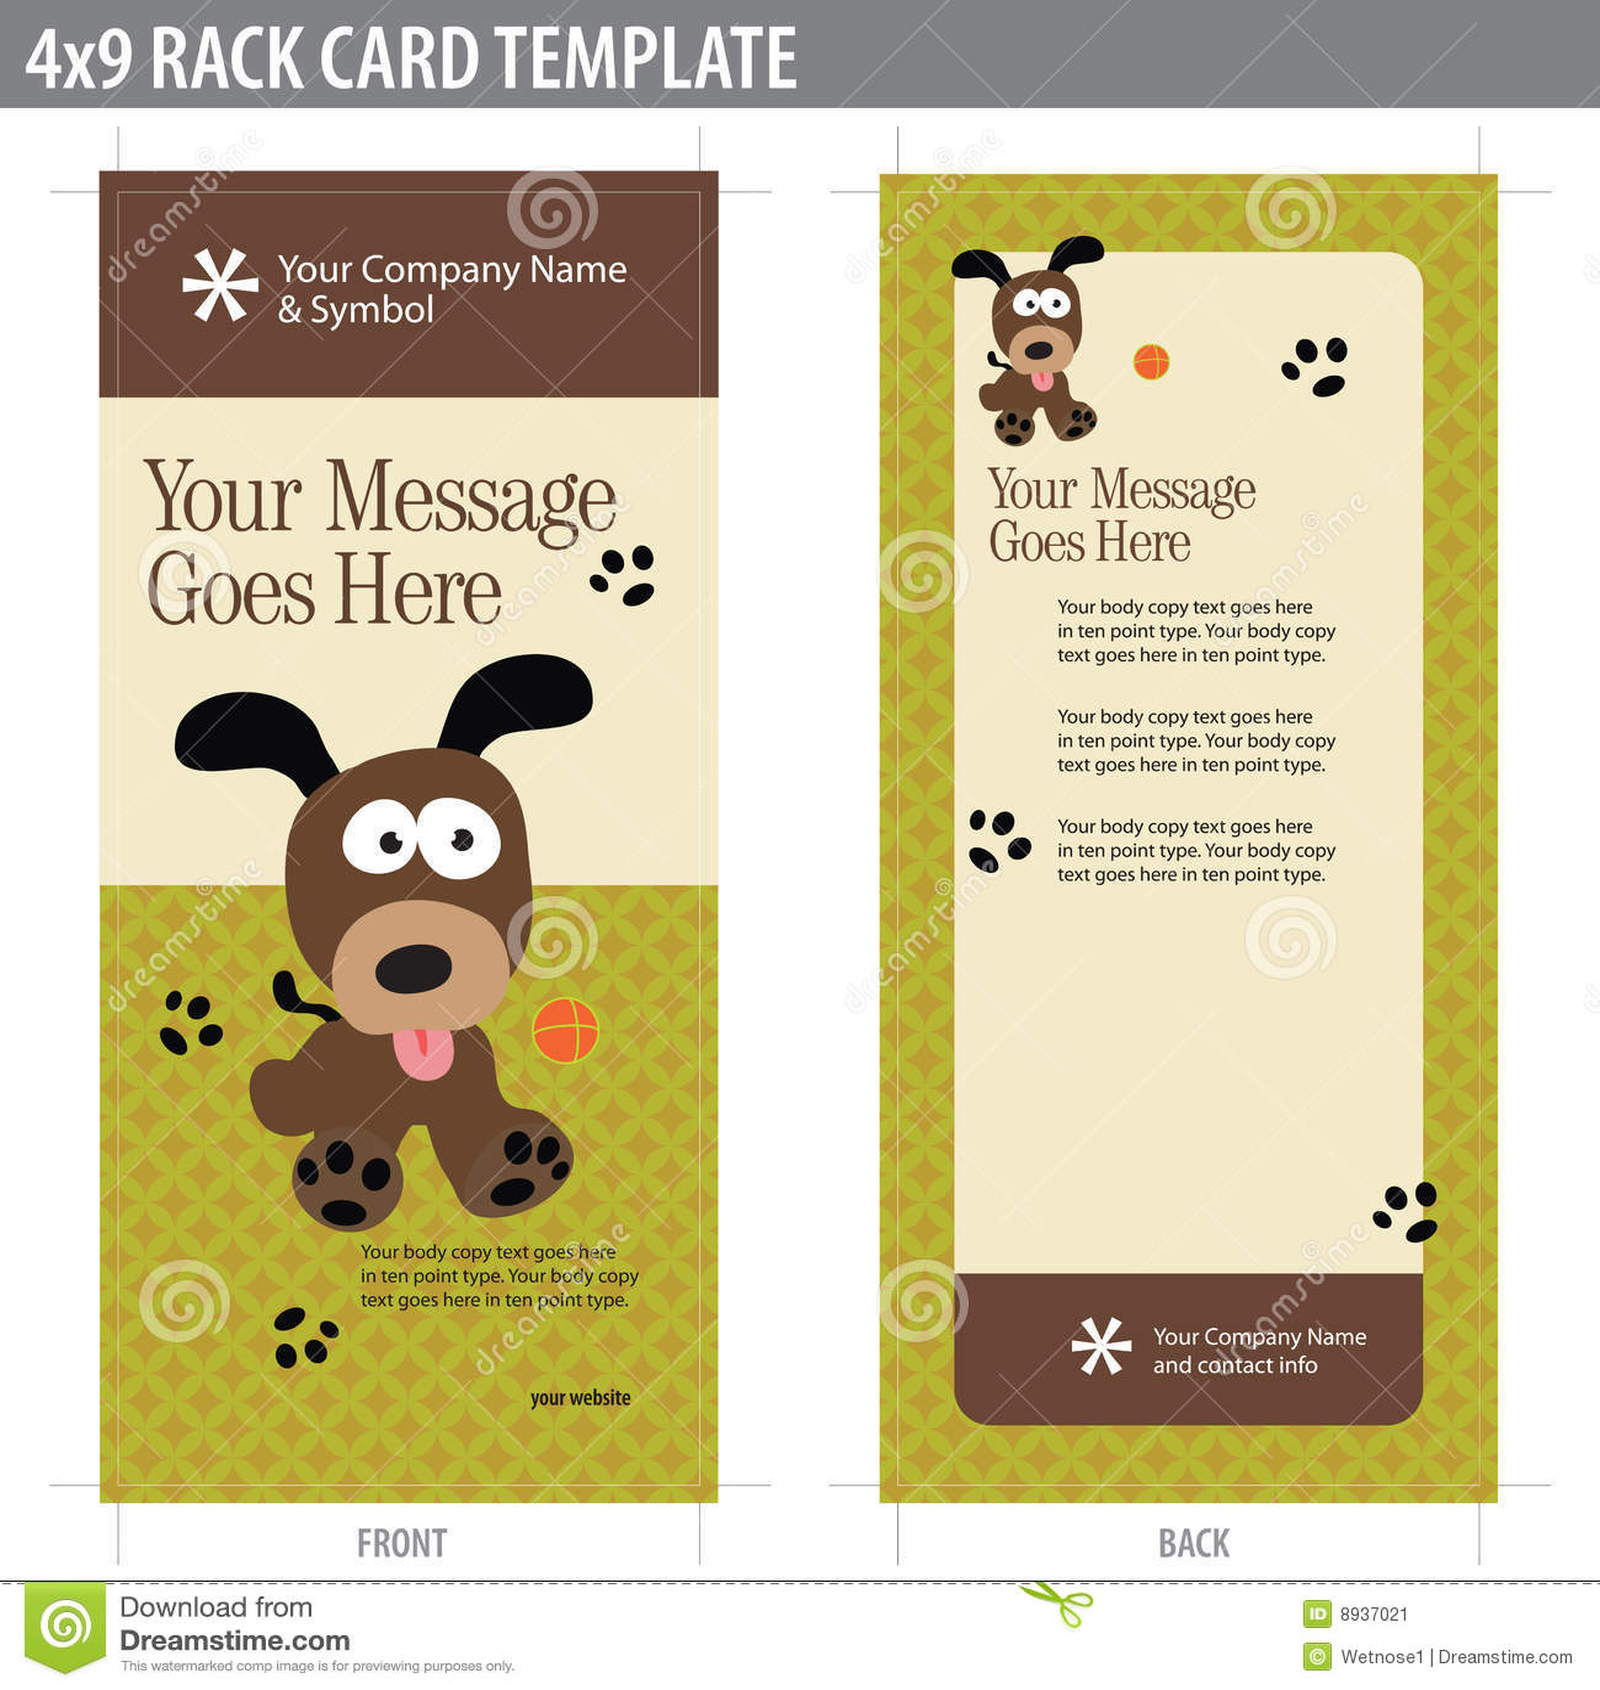 4x9 rack card brochure template stock image image 8937021. Black Bedroom Furniture Sets. Home Design Ideas